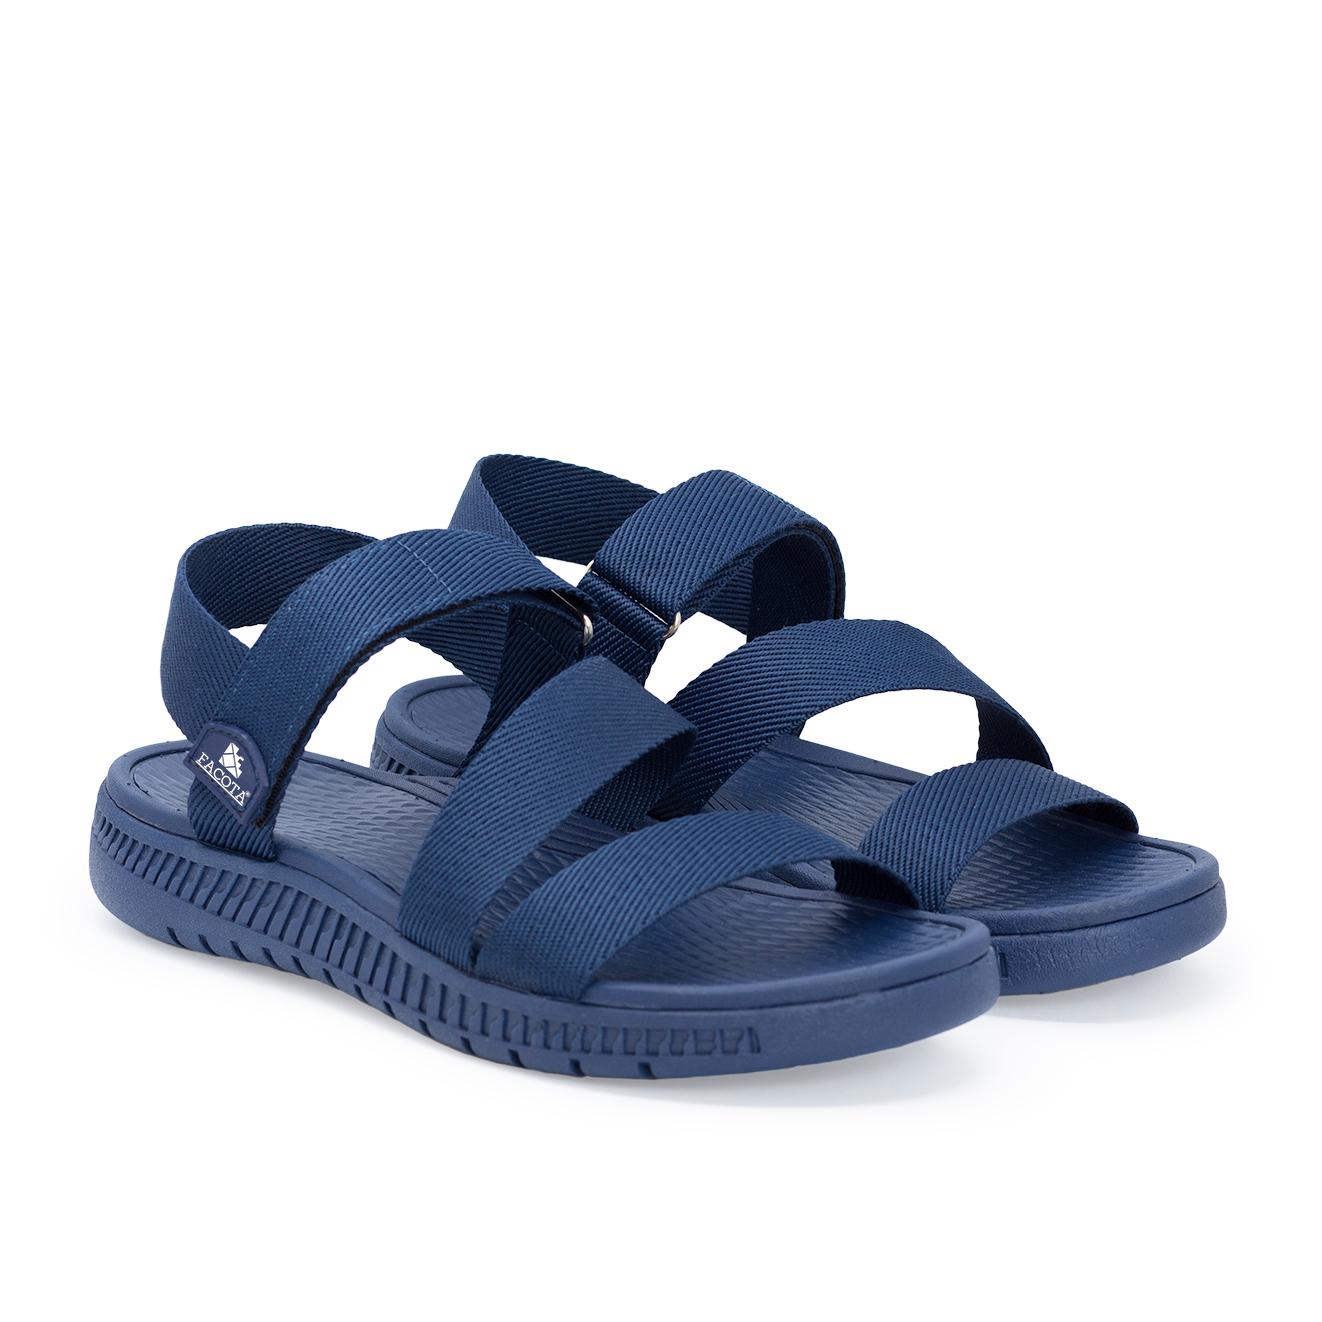 Giày sandal nam quai dù Facota V1 Sport HA04 sandal học sinh